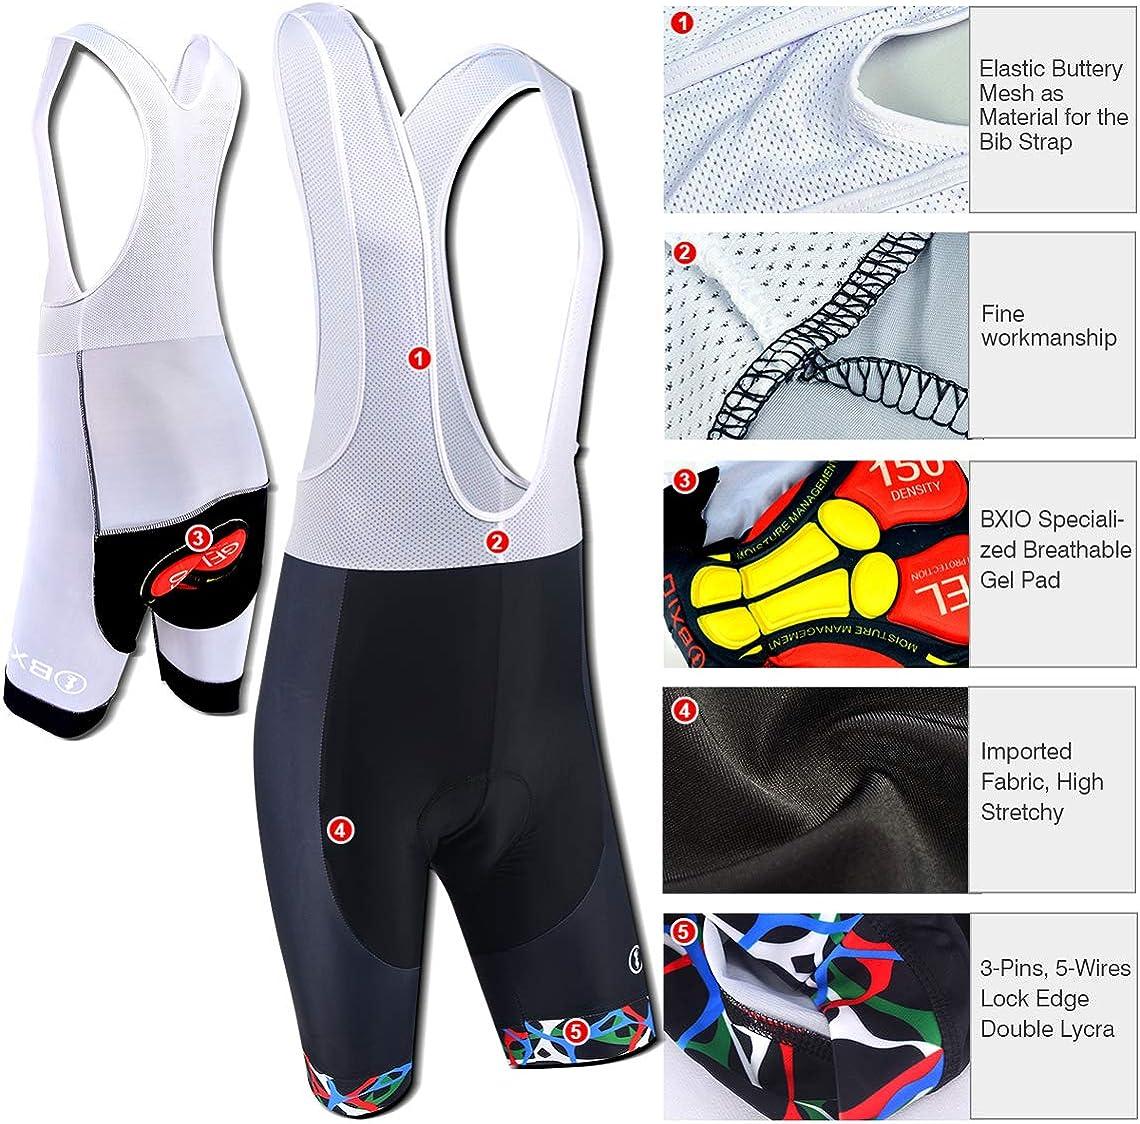 BXIO Mens Cycling Sets Breathable Red Fashion Cycling Jerseys 5D Gel Pad Bib shorts Quich-dry MTB Cycle Wear Short Sleeves 213